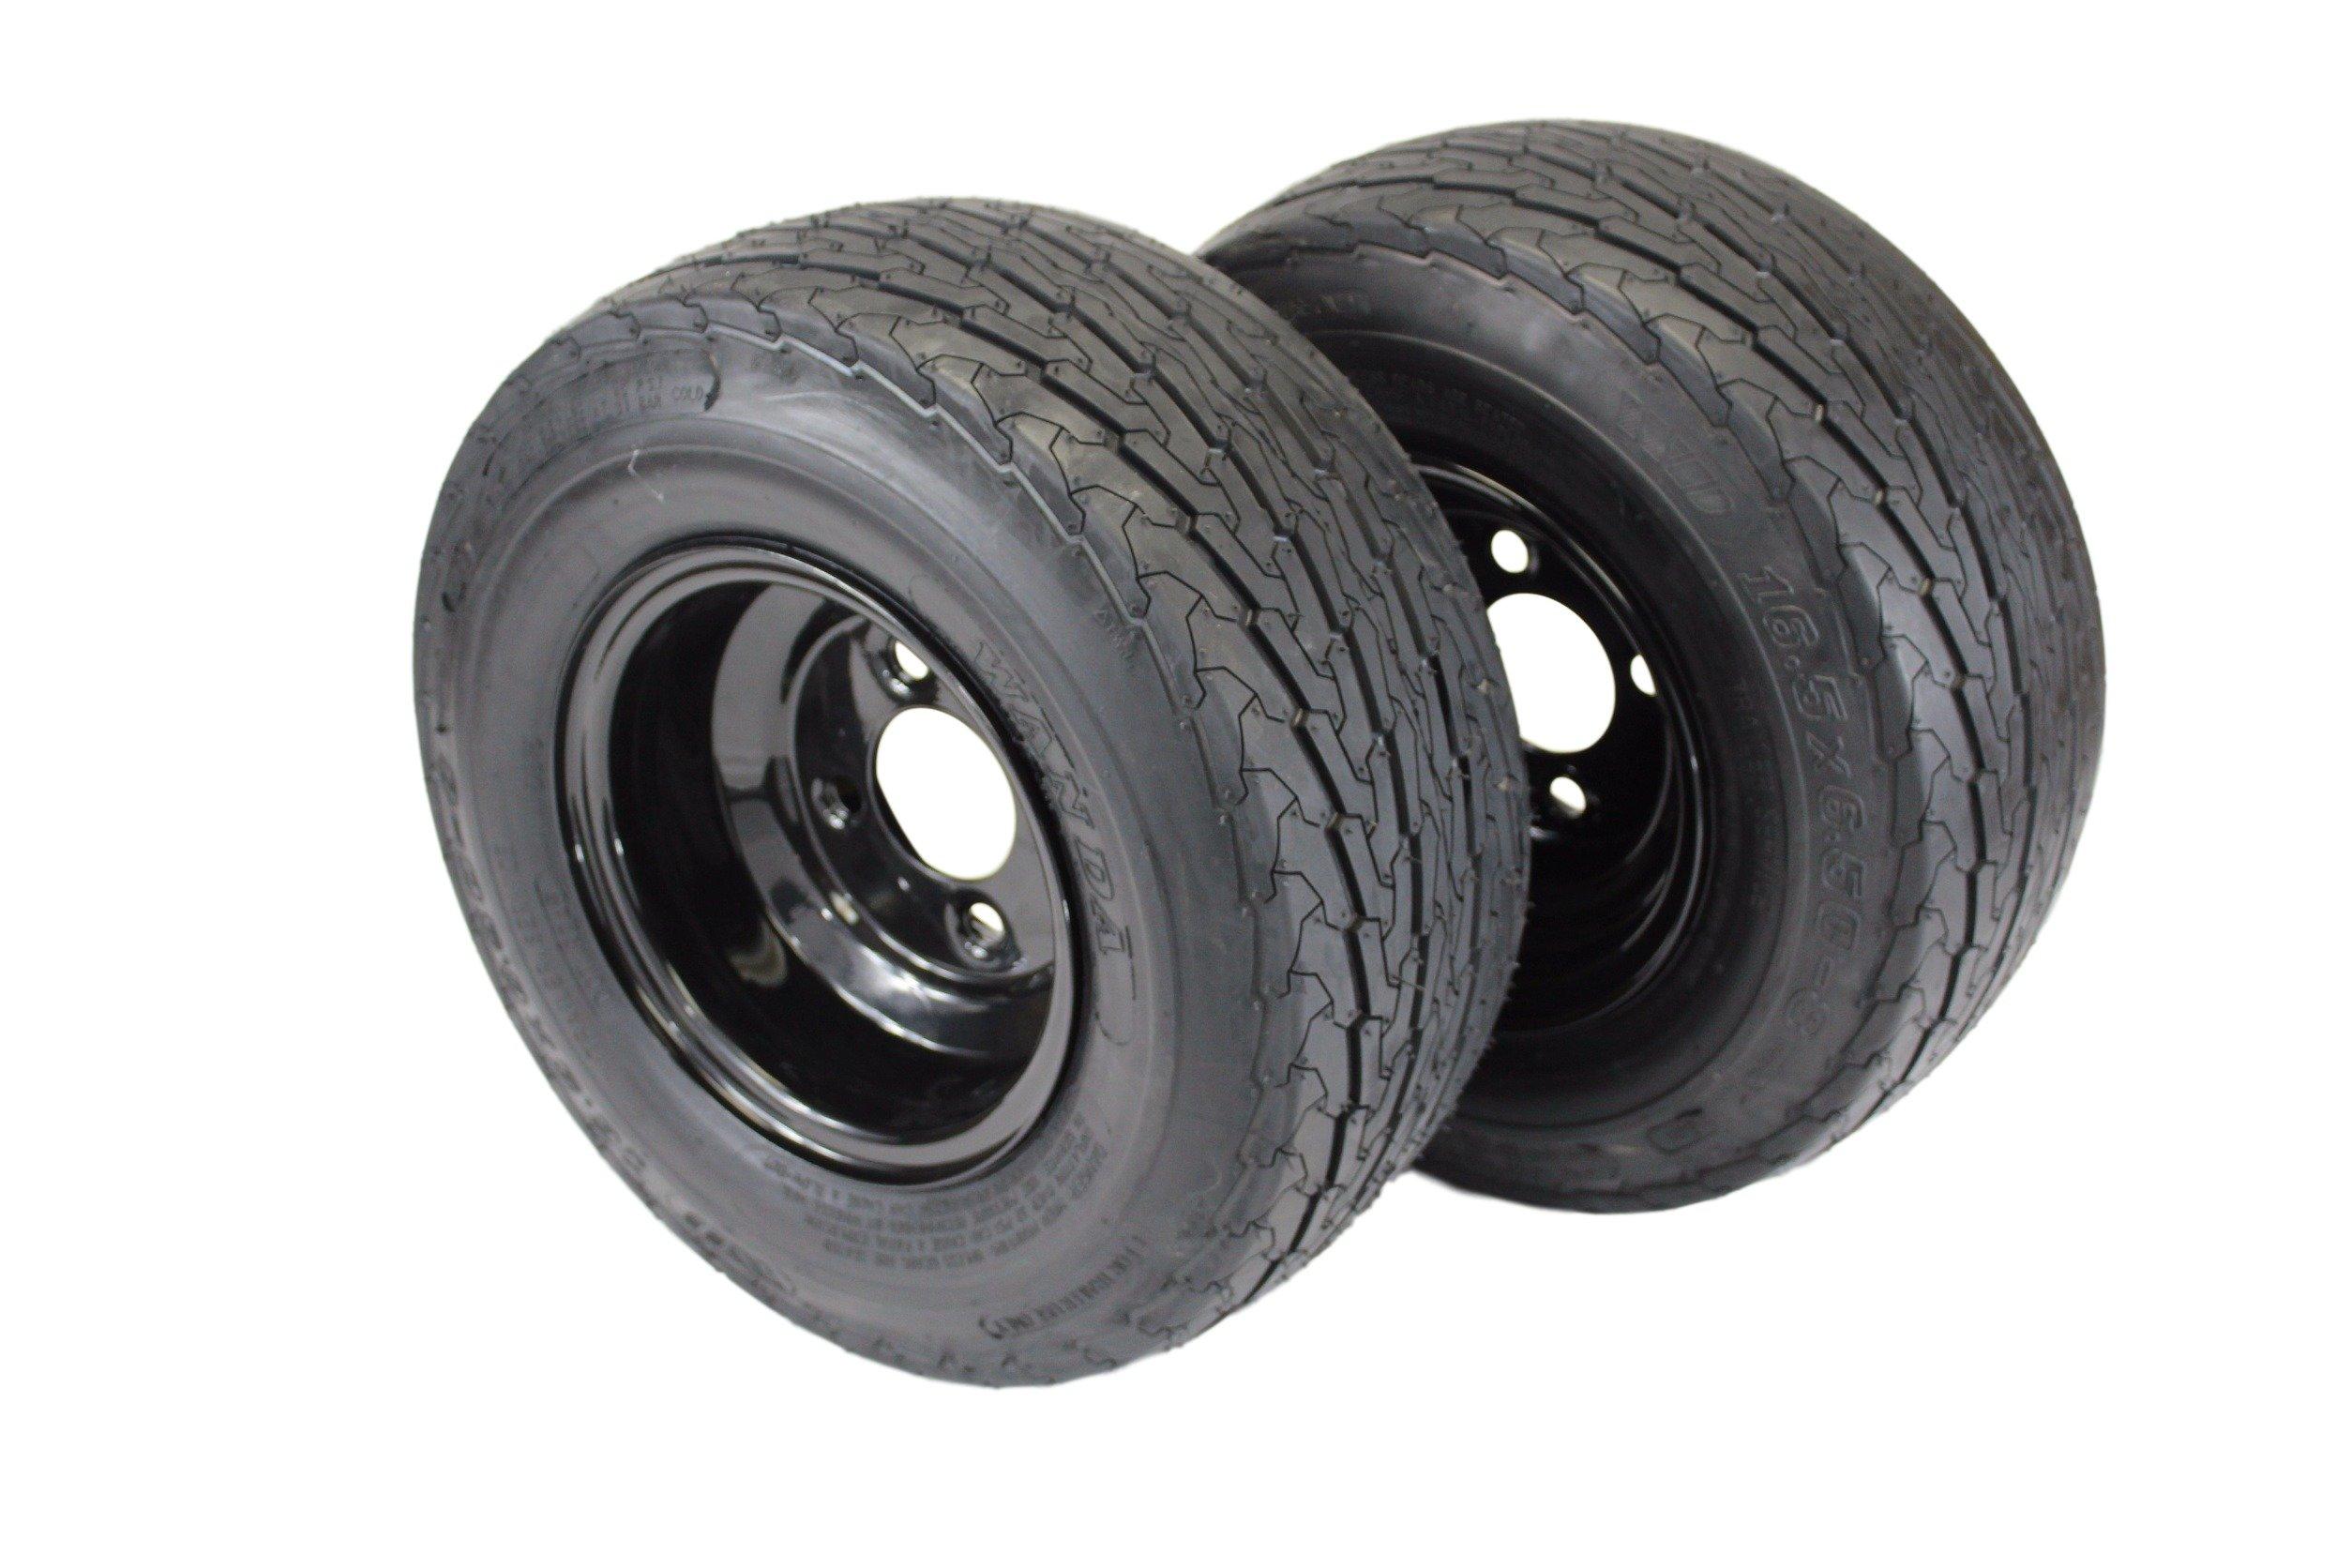 (Set of 2) 16.5x6.50-8 LRB 4 Ply Trailer Tires on 4 Lug Glossy Black Steel Wheel